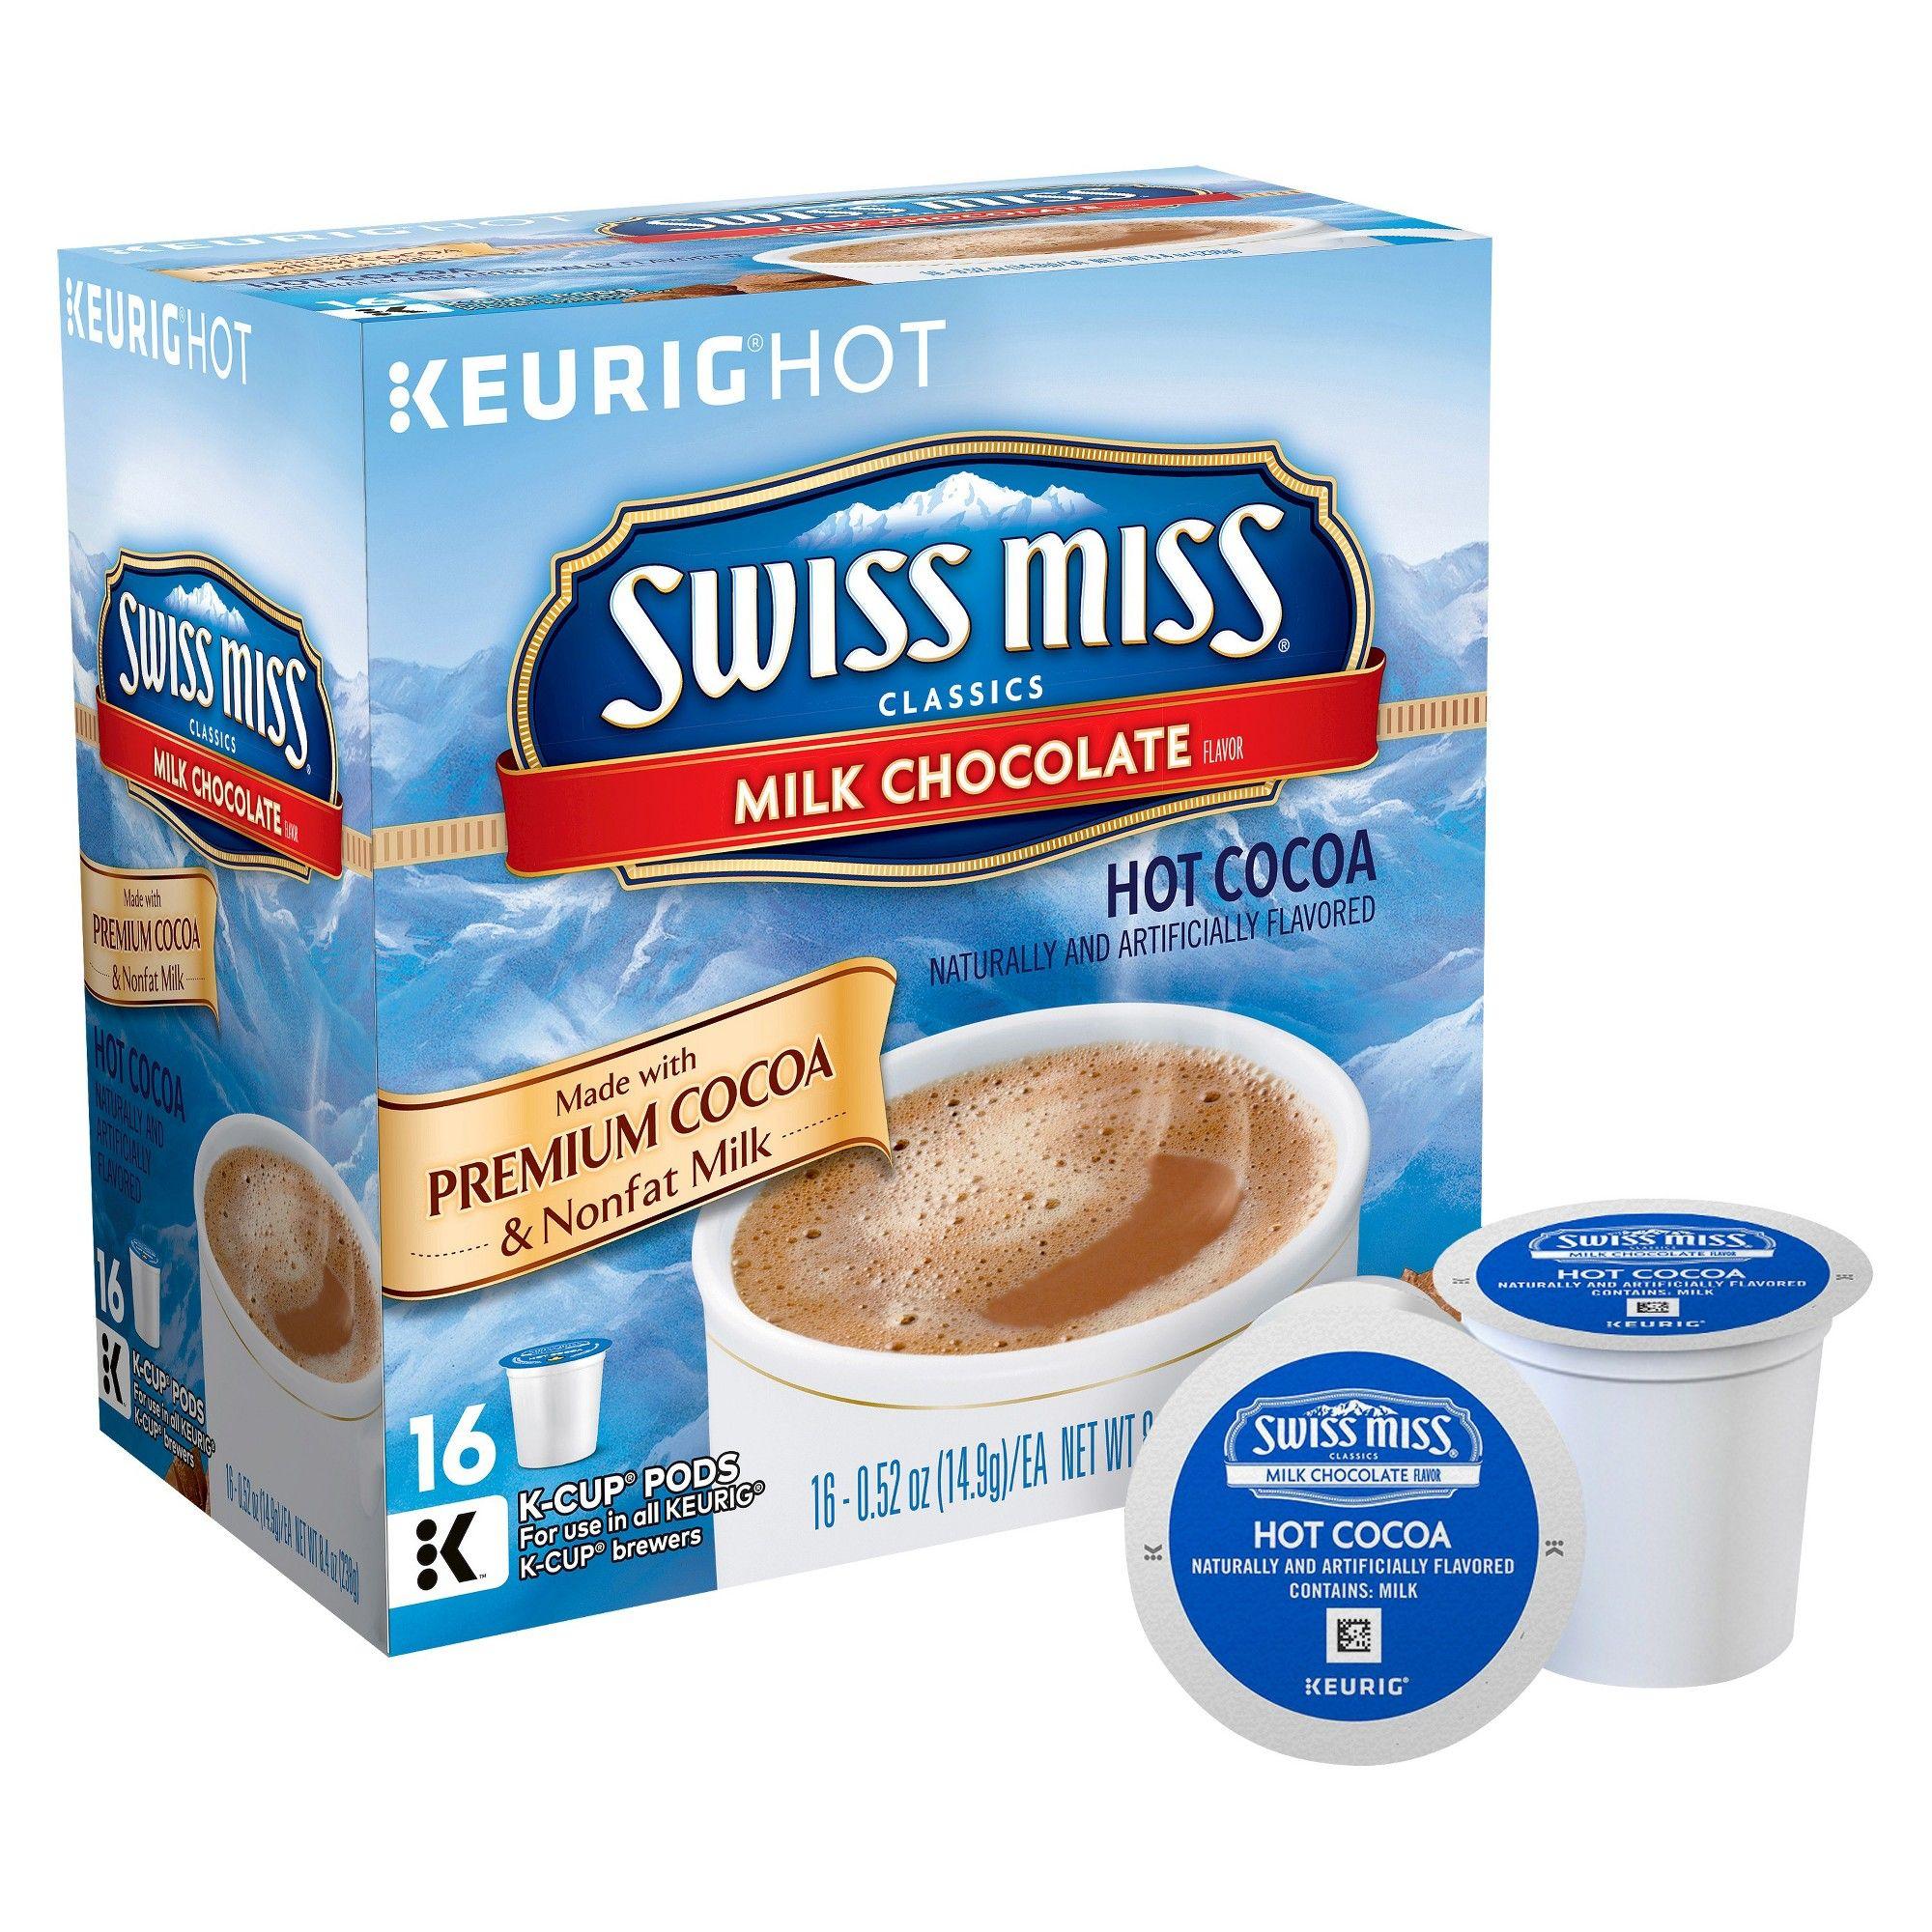 Swiss Miss Milk Chocolate Hot Cocoa Keurig K Cup Pods 16ct Hot Cocoa Swiss Miss K Cup Flavors